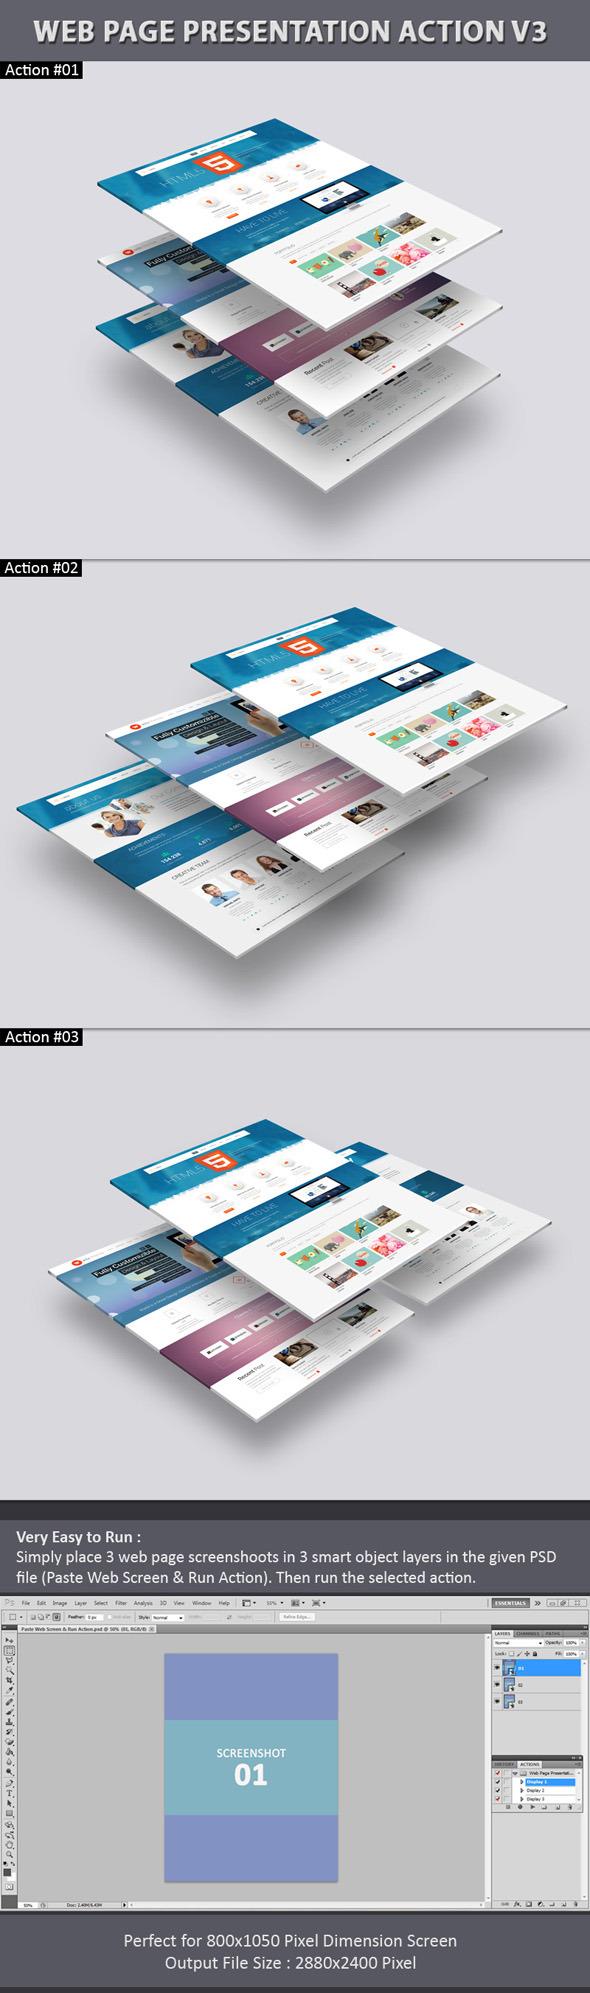 Web Page Presentation Action V3